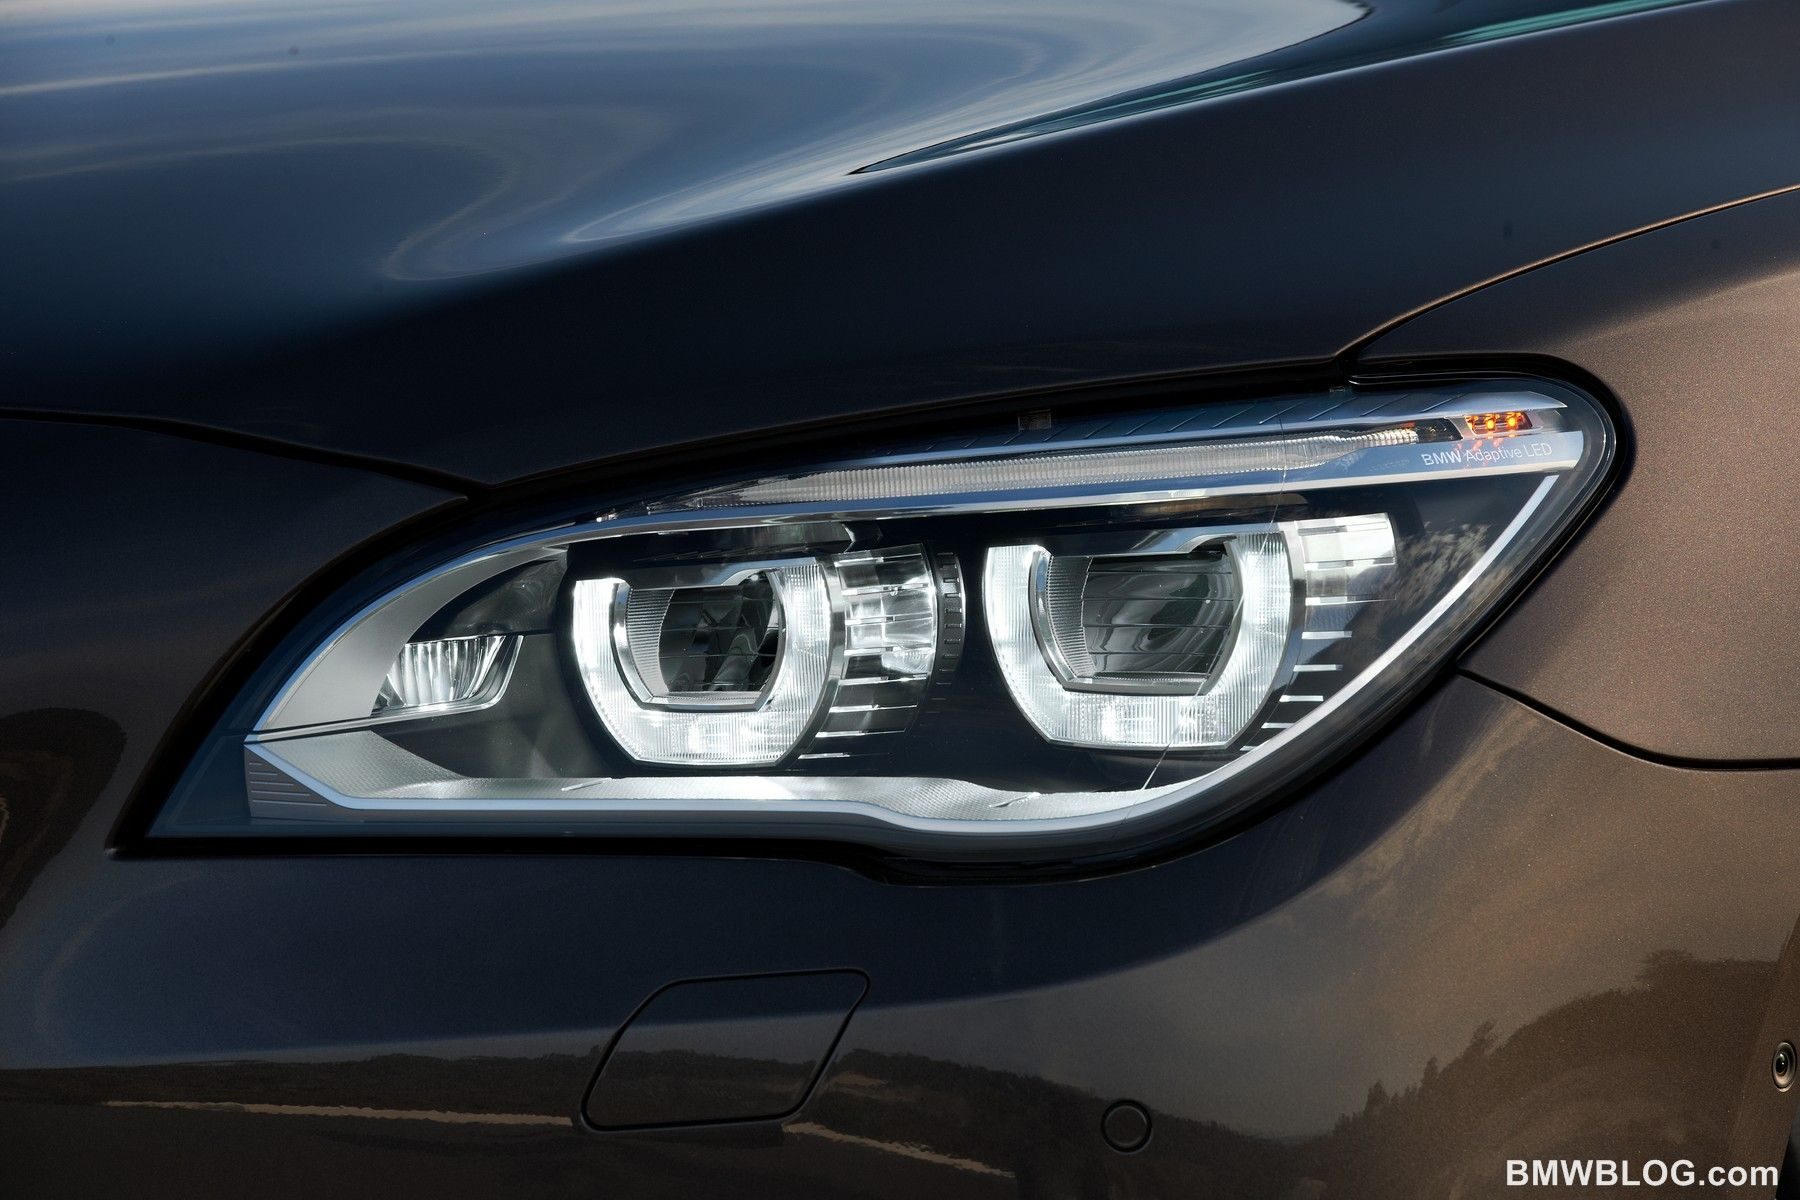 BMW 7 Series Crystal HD Light Wallpaper